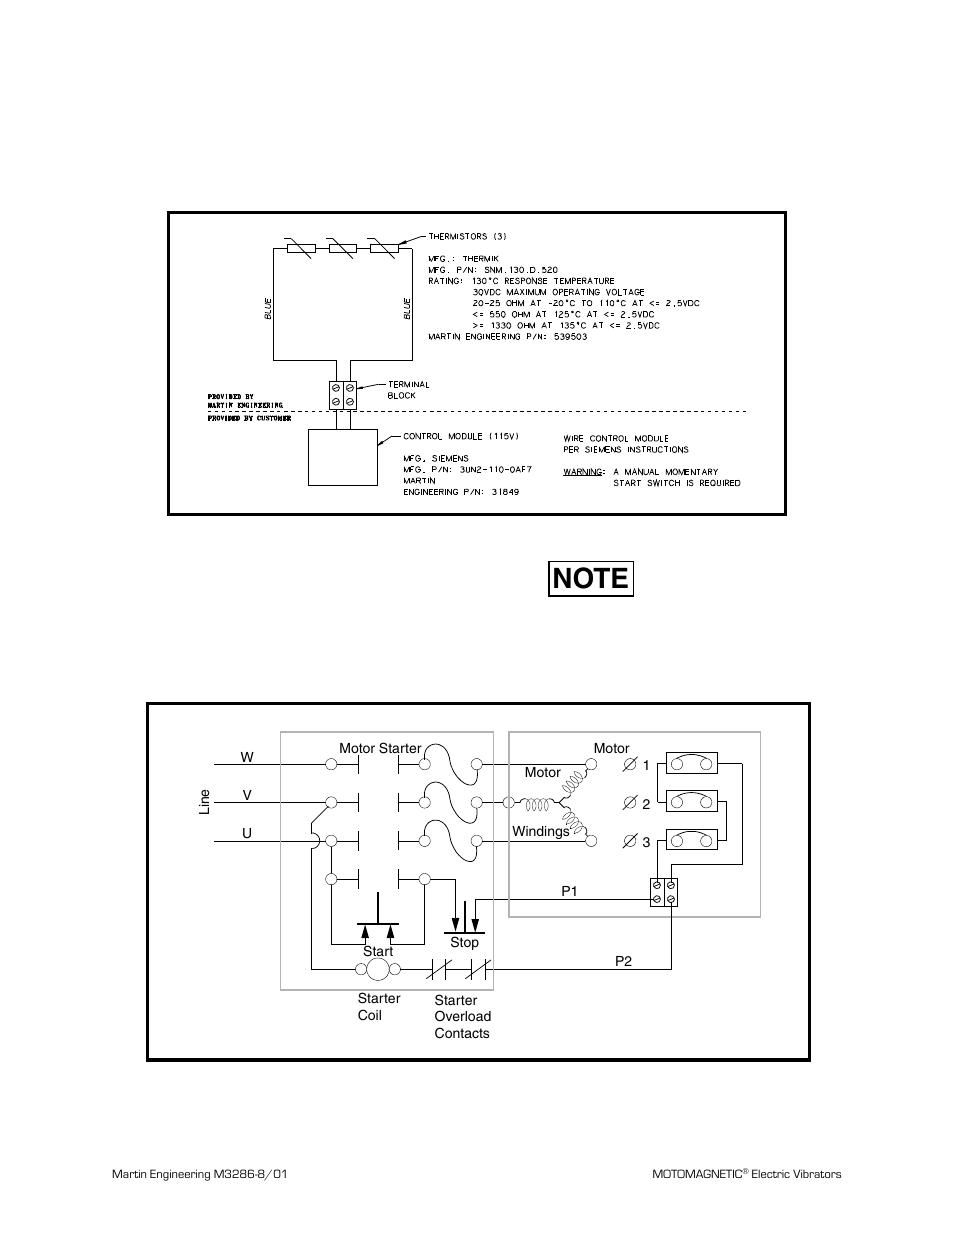 hight resolution of figure 7 thermistor wiring diagram figure 8 manual resetfigure 7 thermistor wiring diagram figure